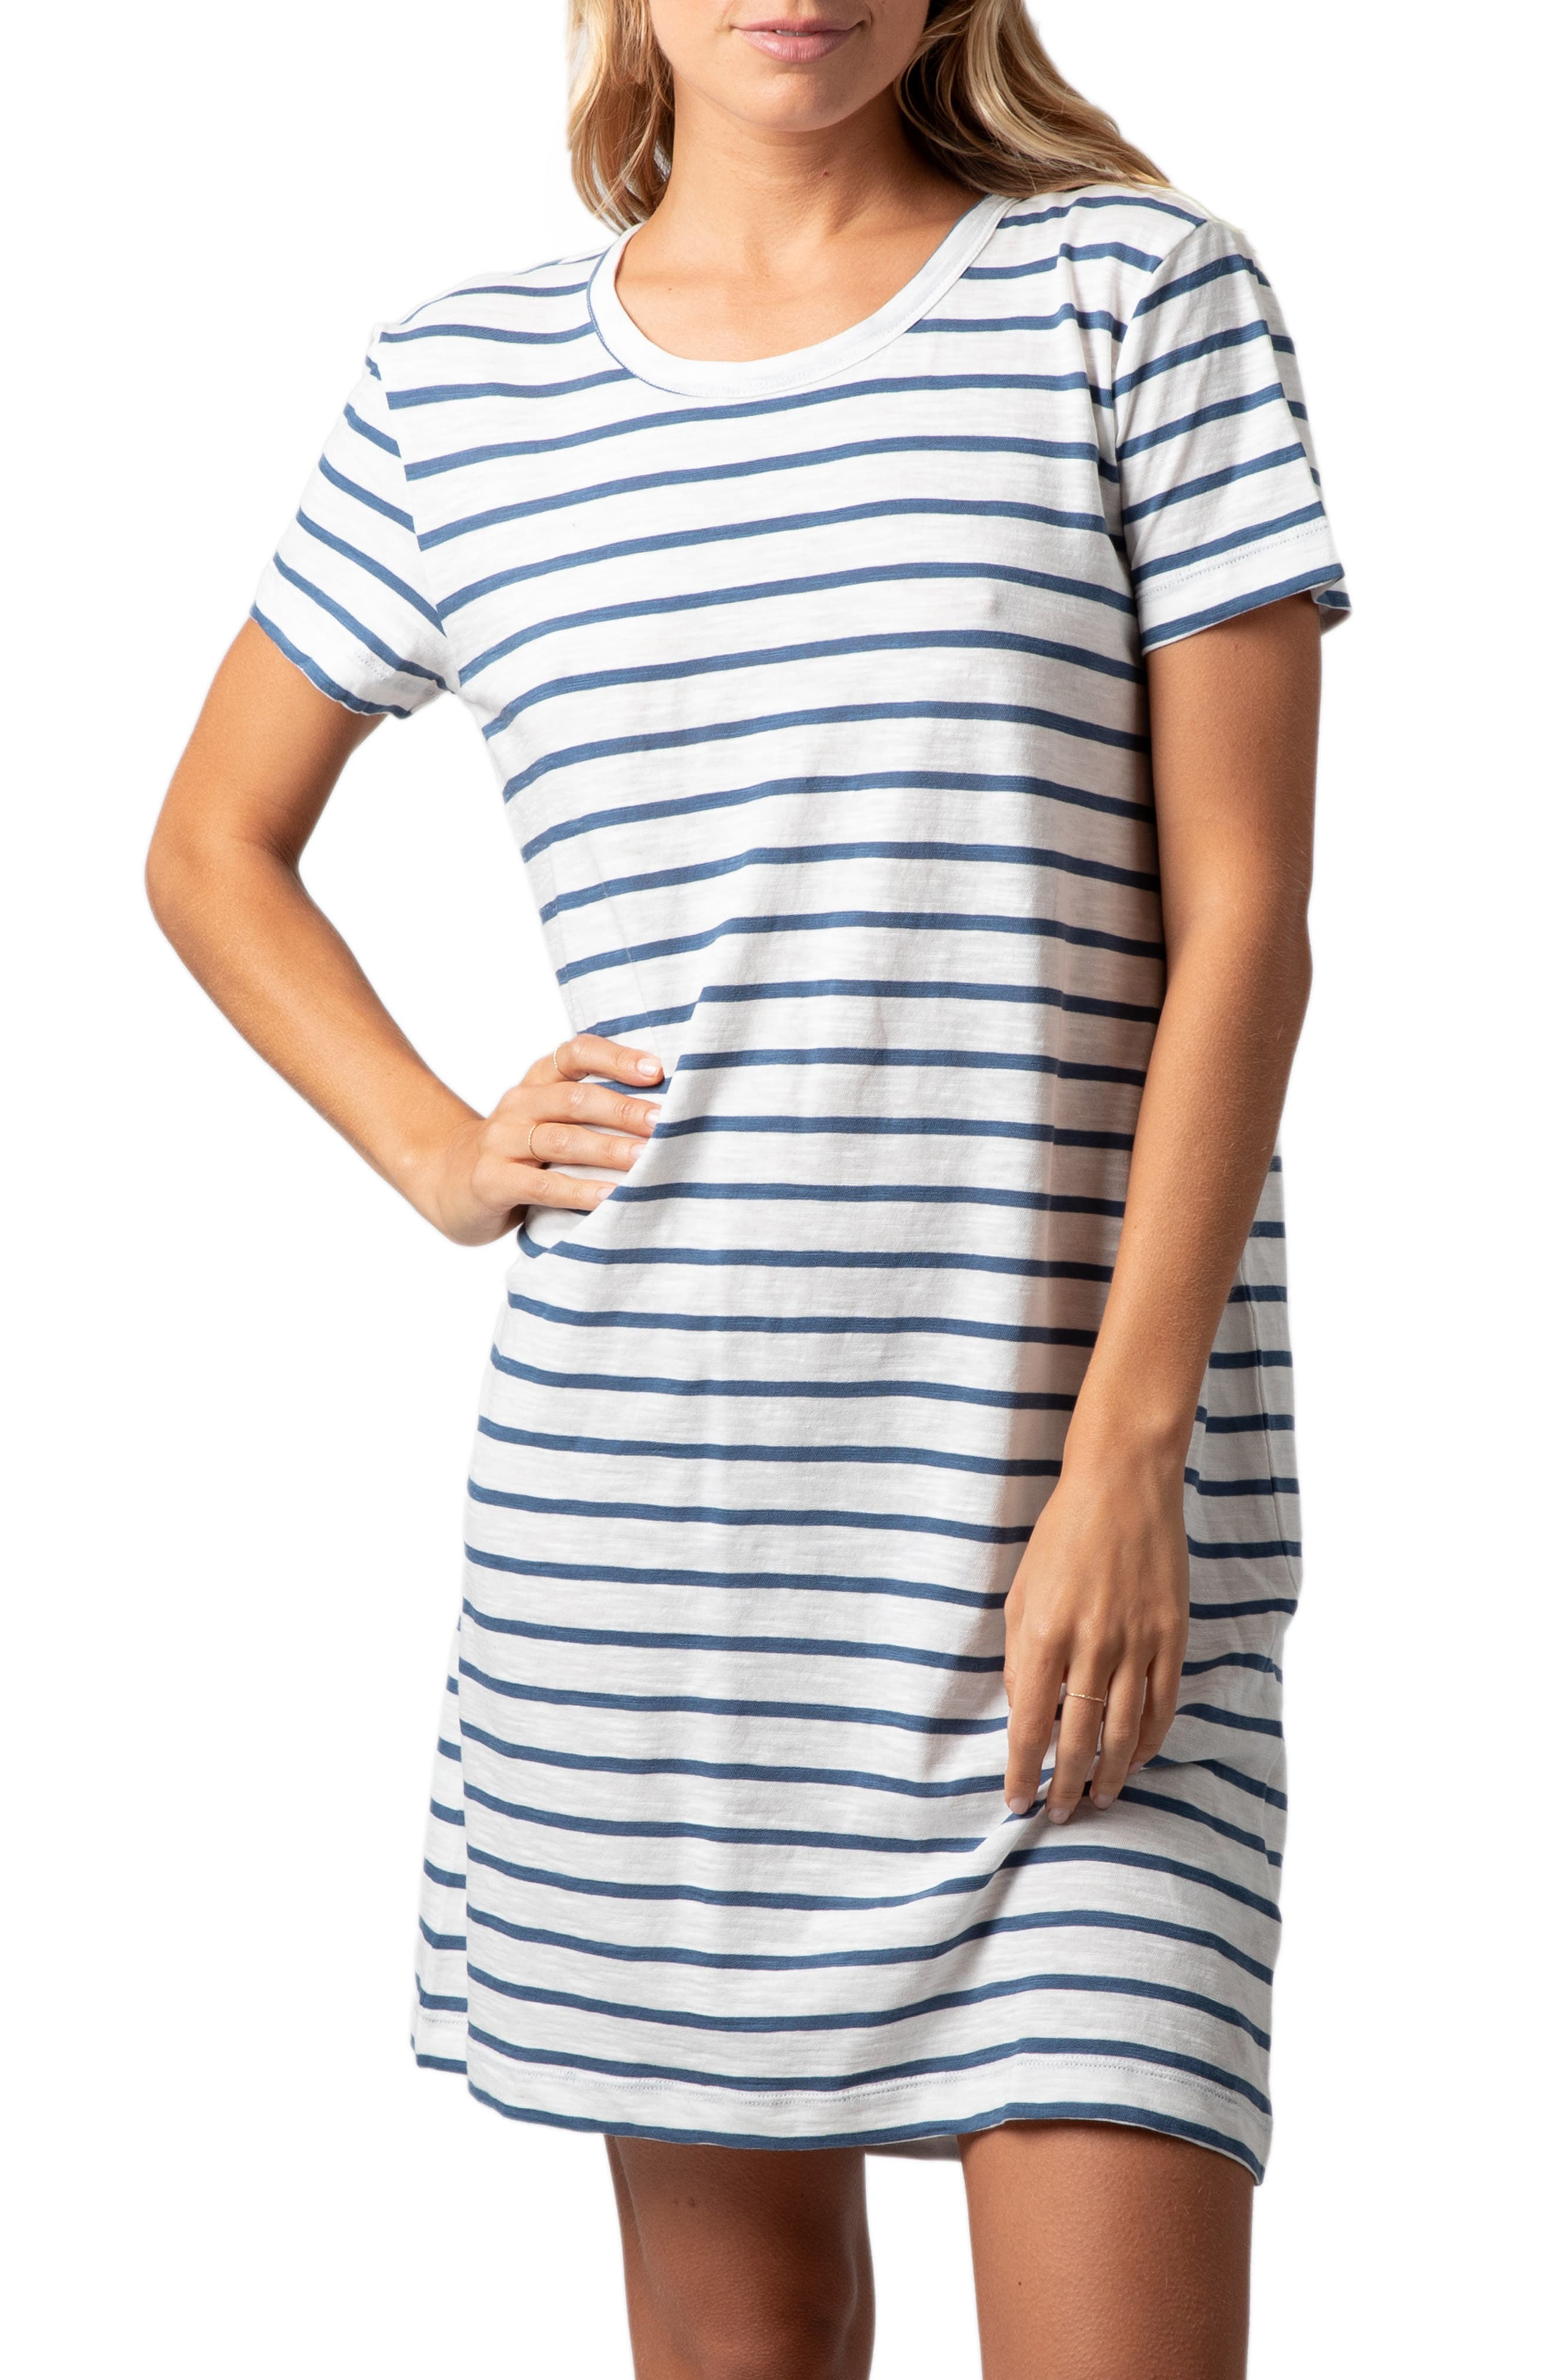 RIP CURL, Surf Essentials T-Shirt Dress, Main thumbnail 1, color, VANILLA